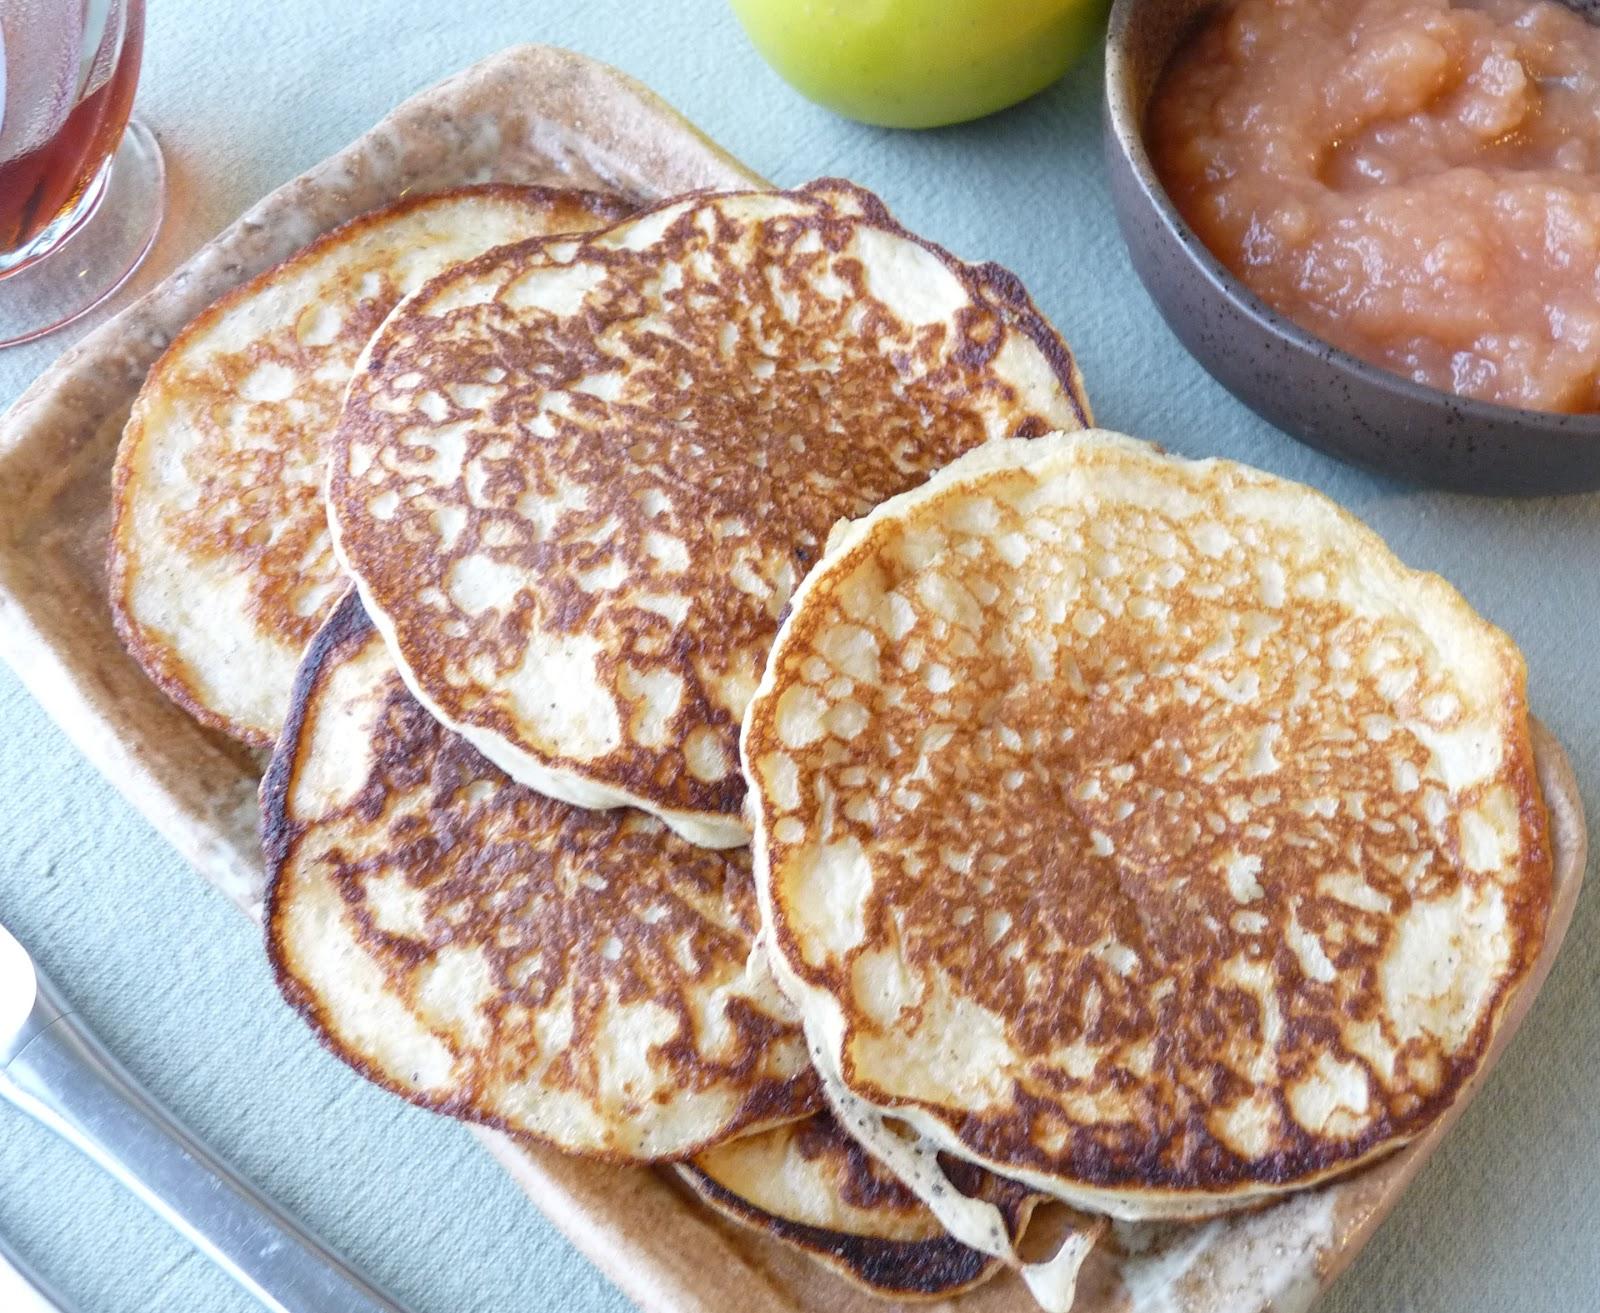 Seasonal Ontario Food: Cottage Cheese Pancakes